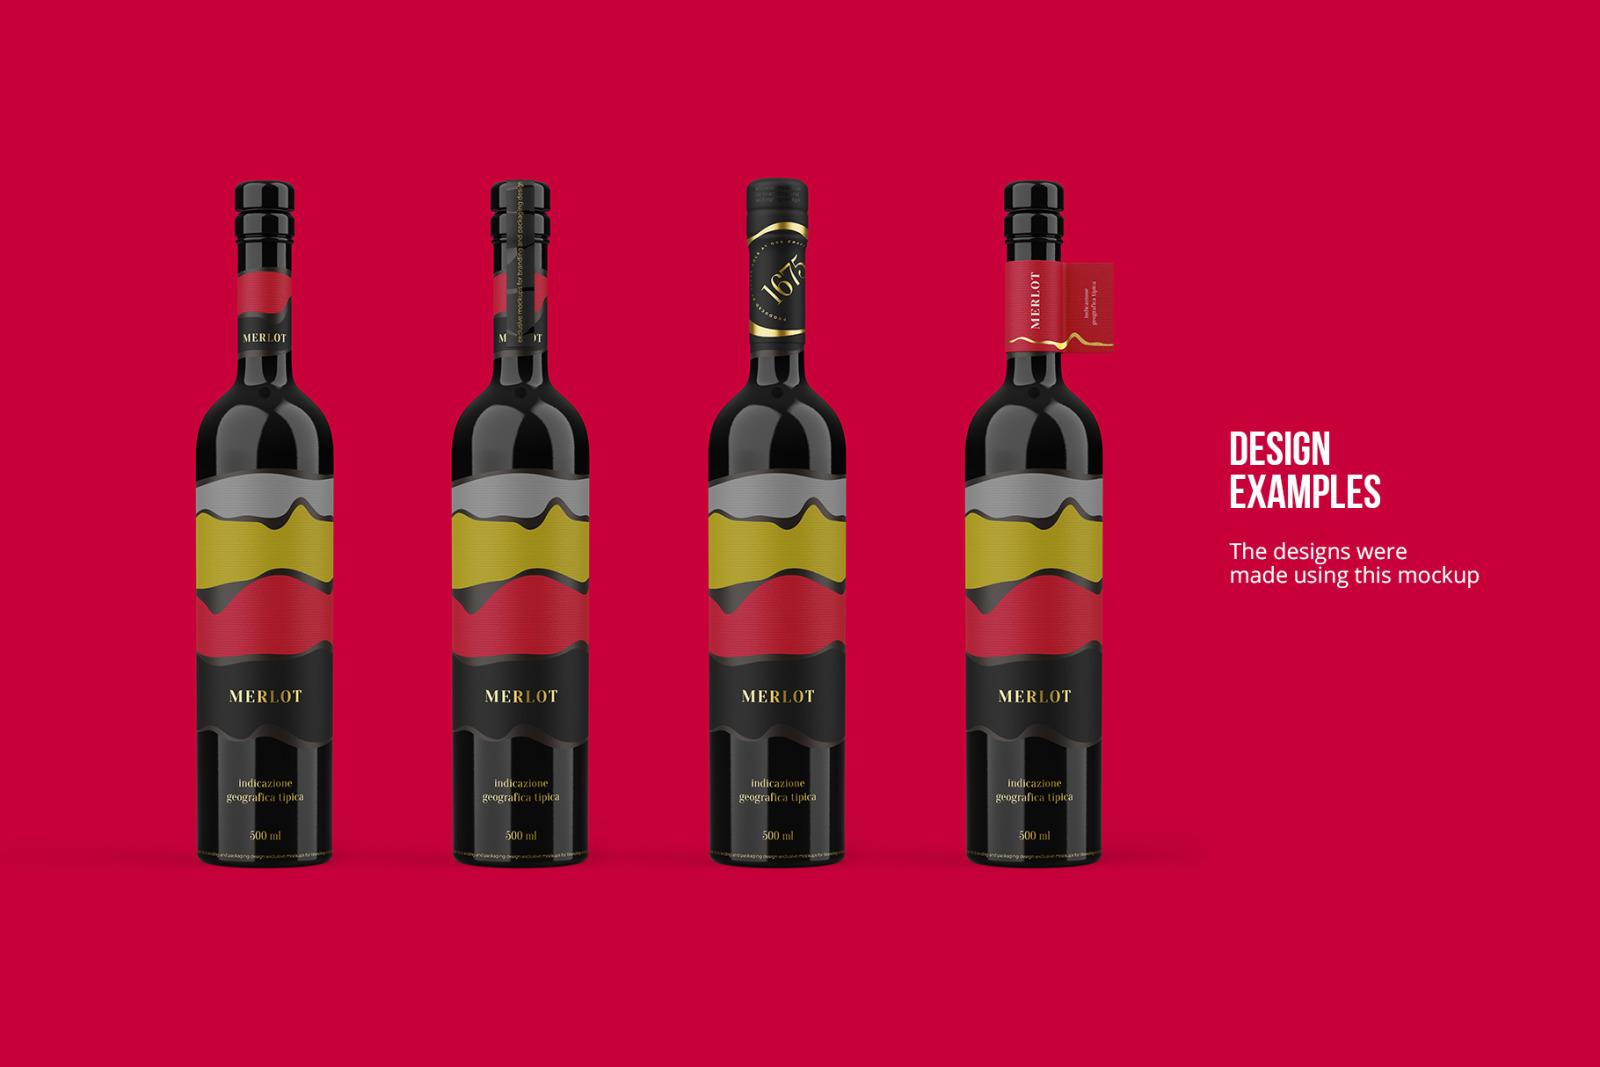 Ceramic Wine Bottle Mockup with Tube - PRO + 7 material